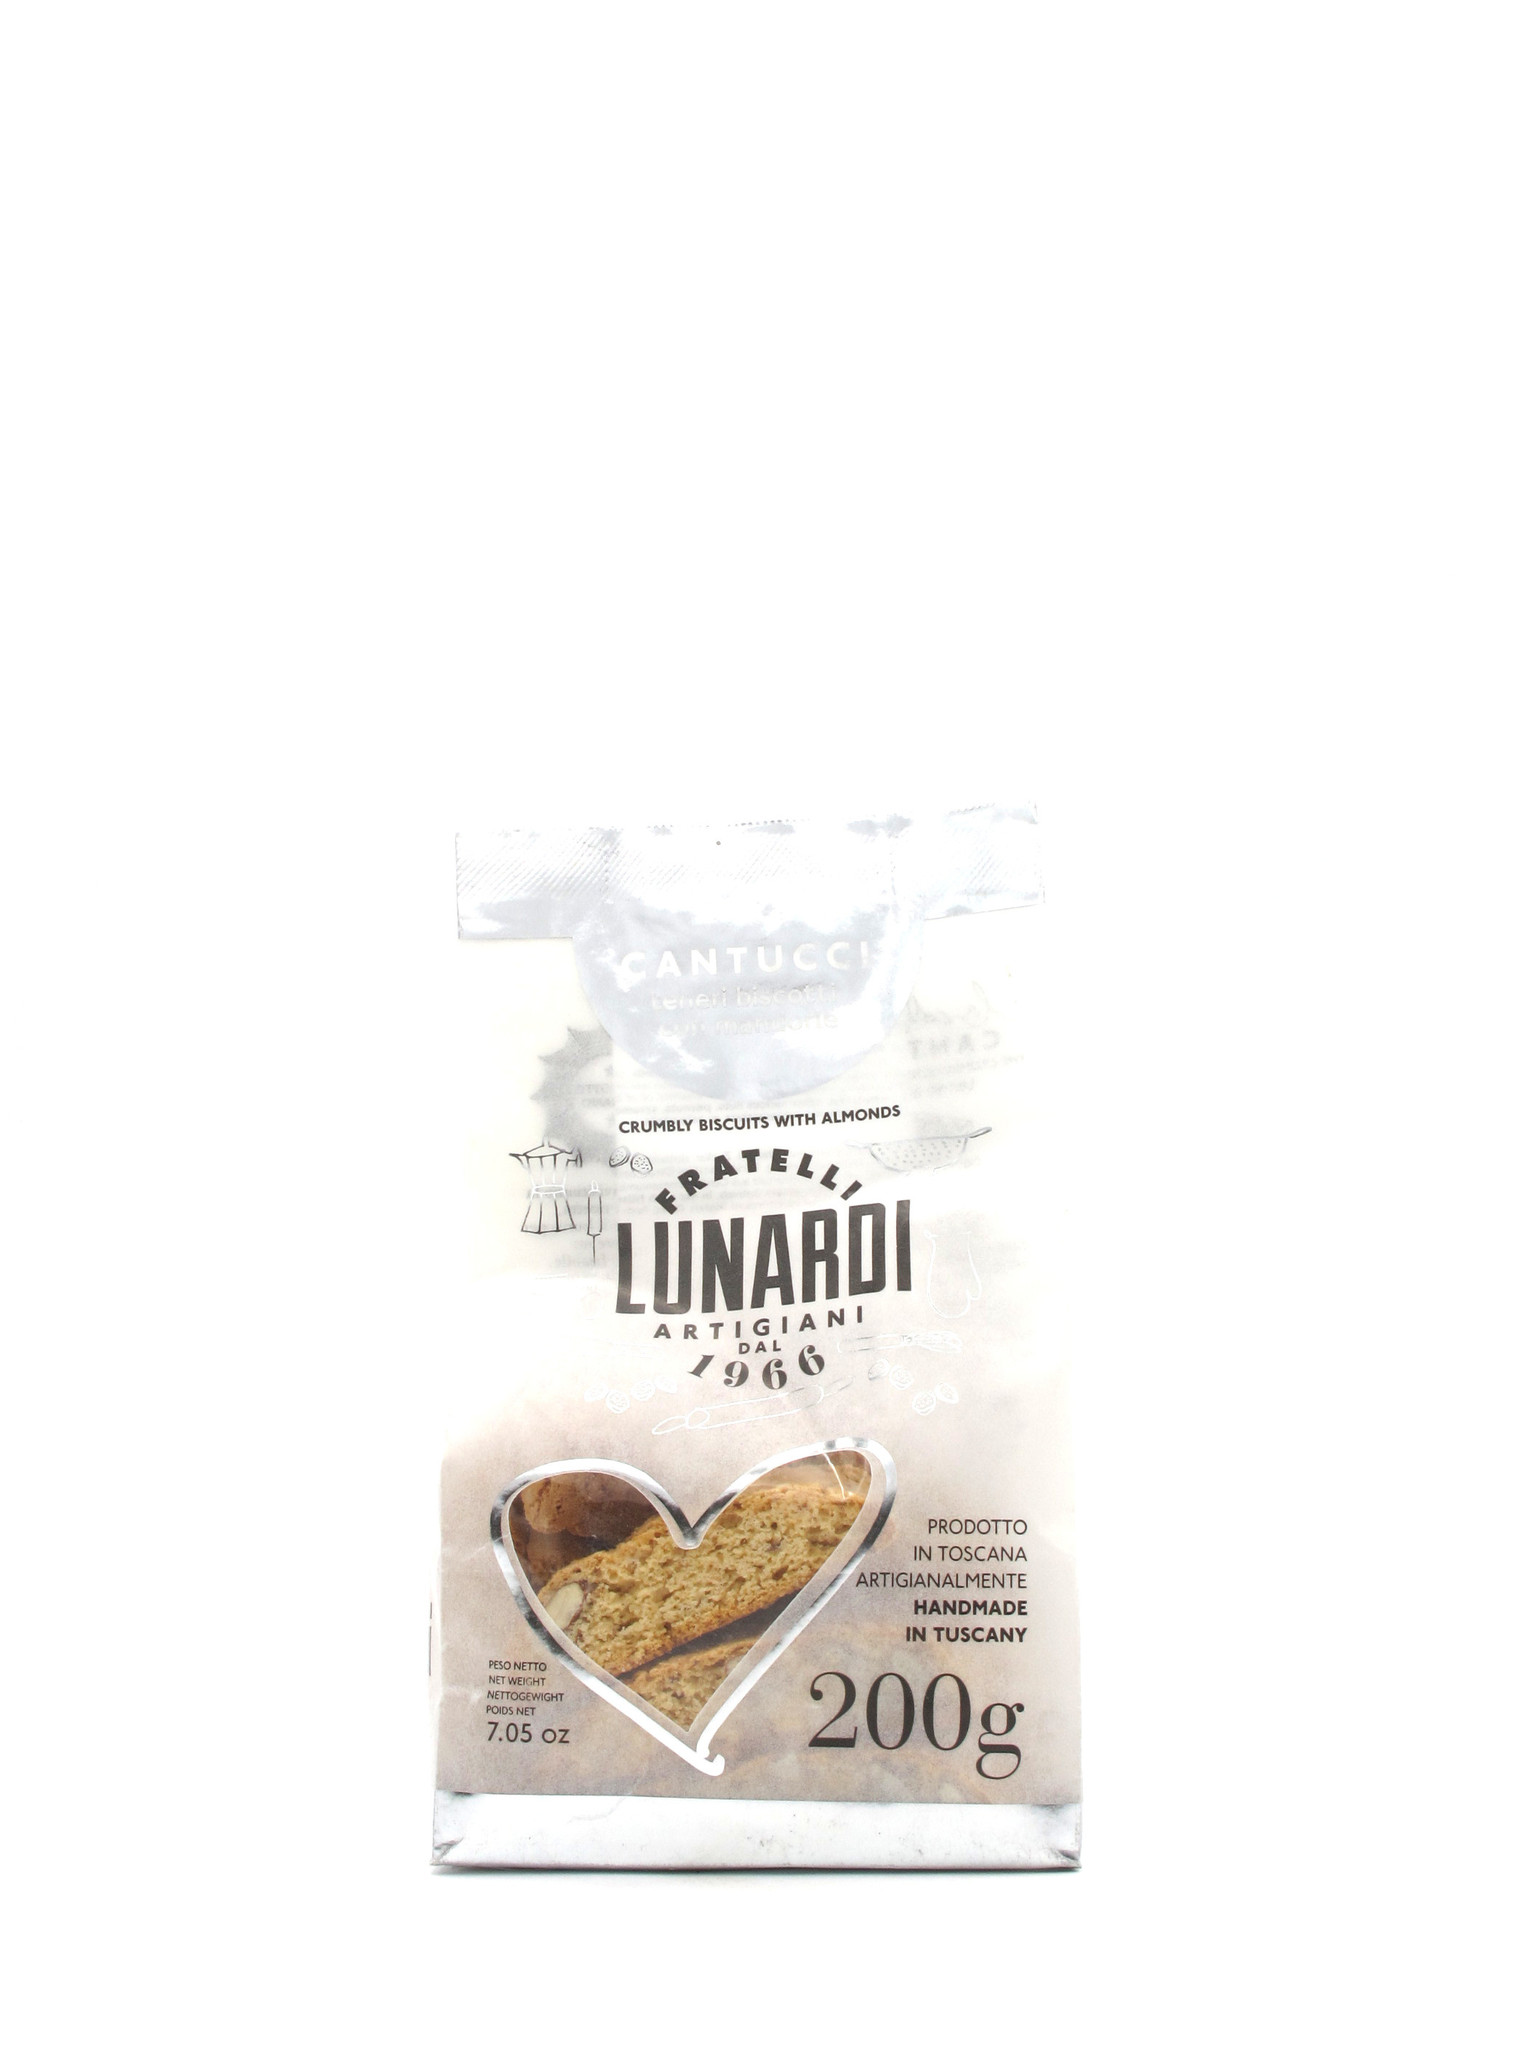 Lunardi Fraetelli Lunardi Almond Biscotti 200gr